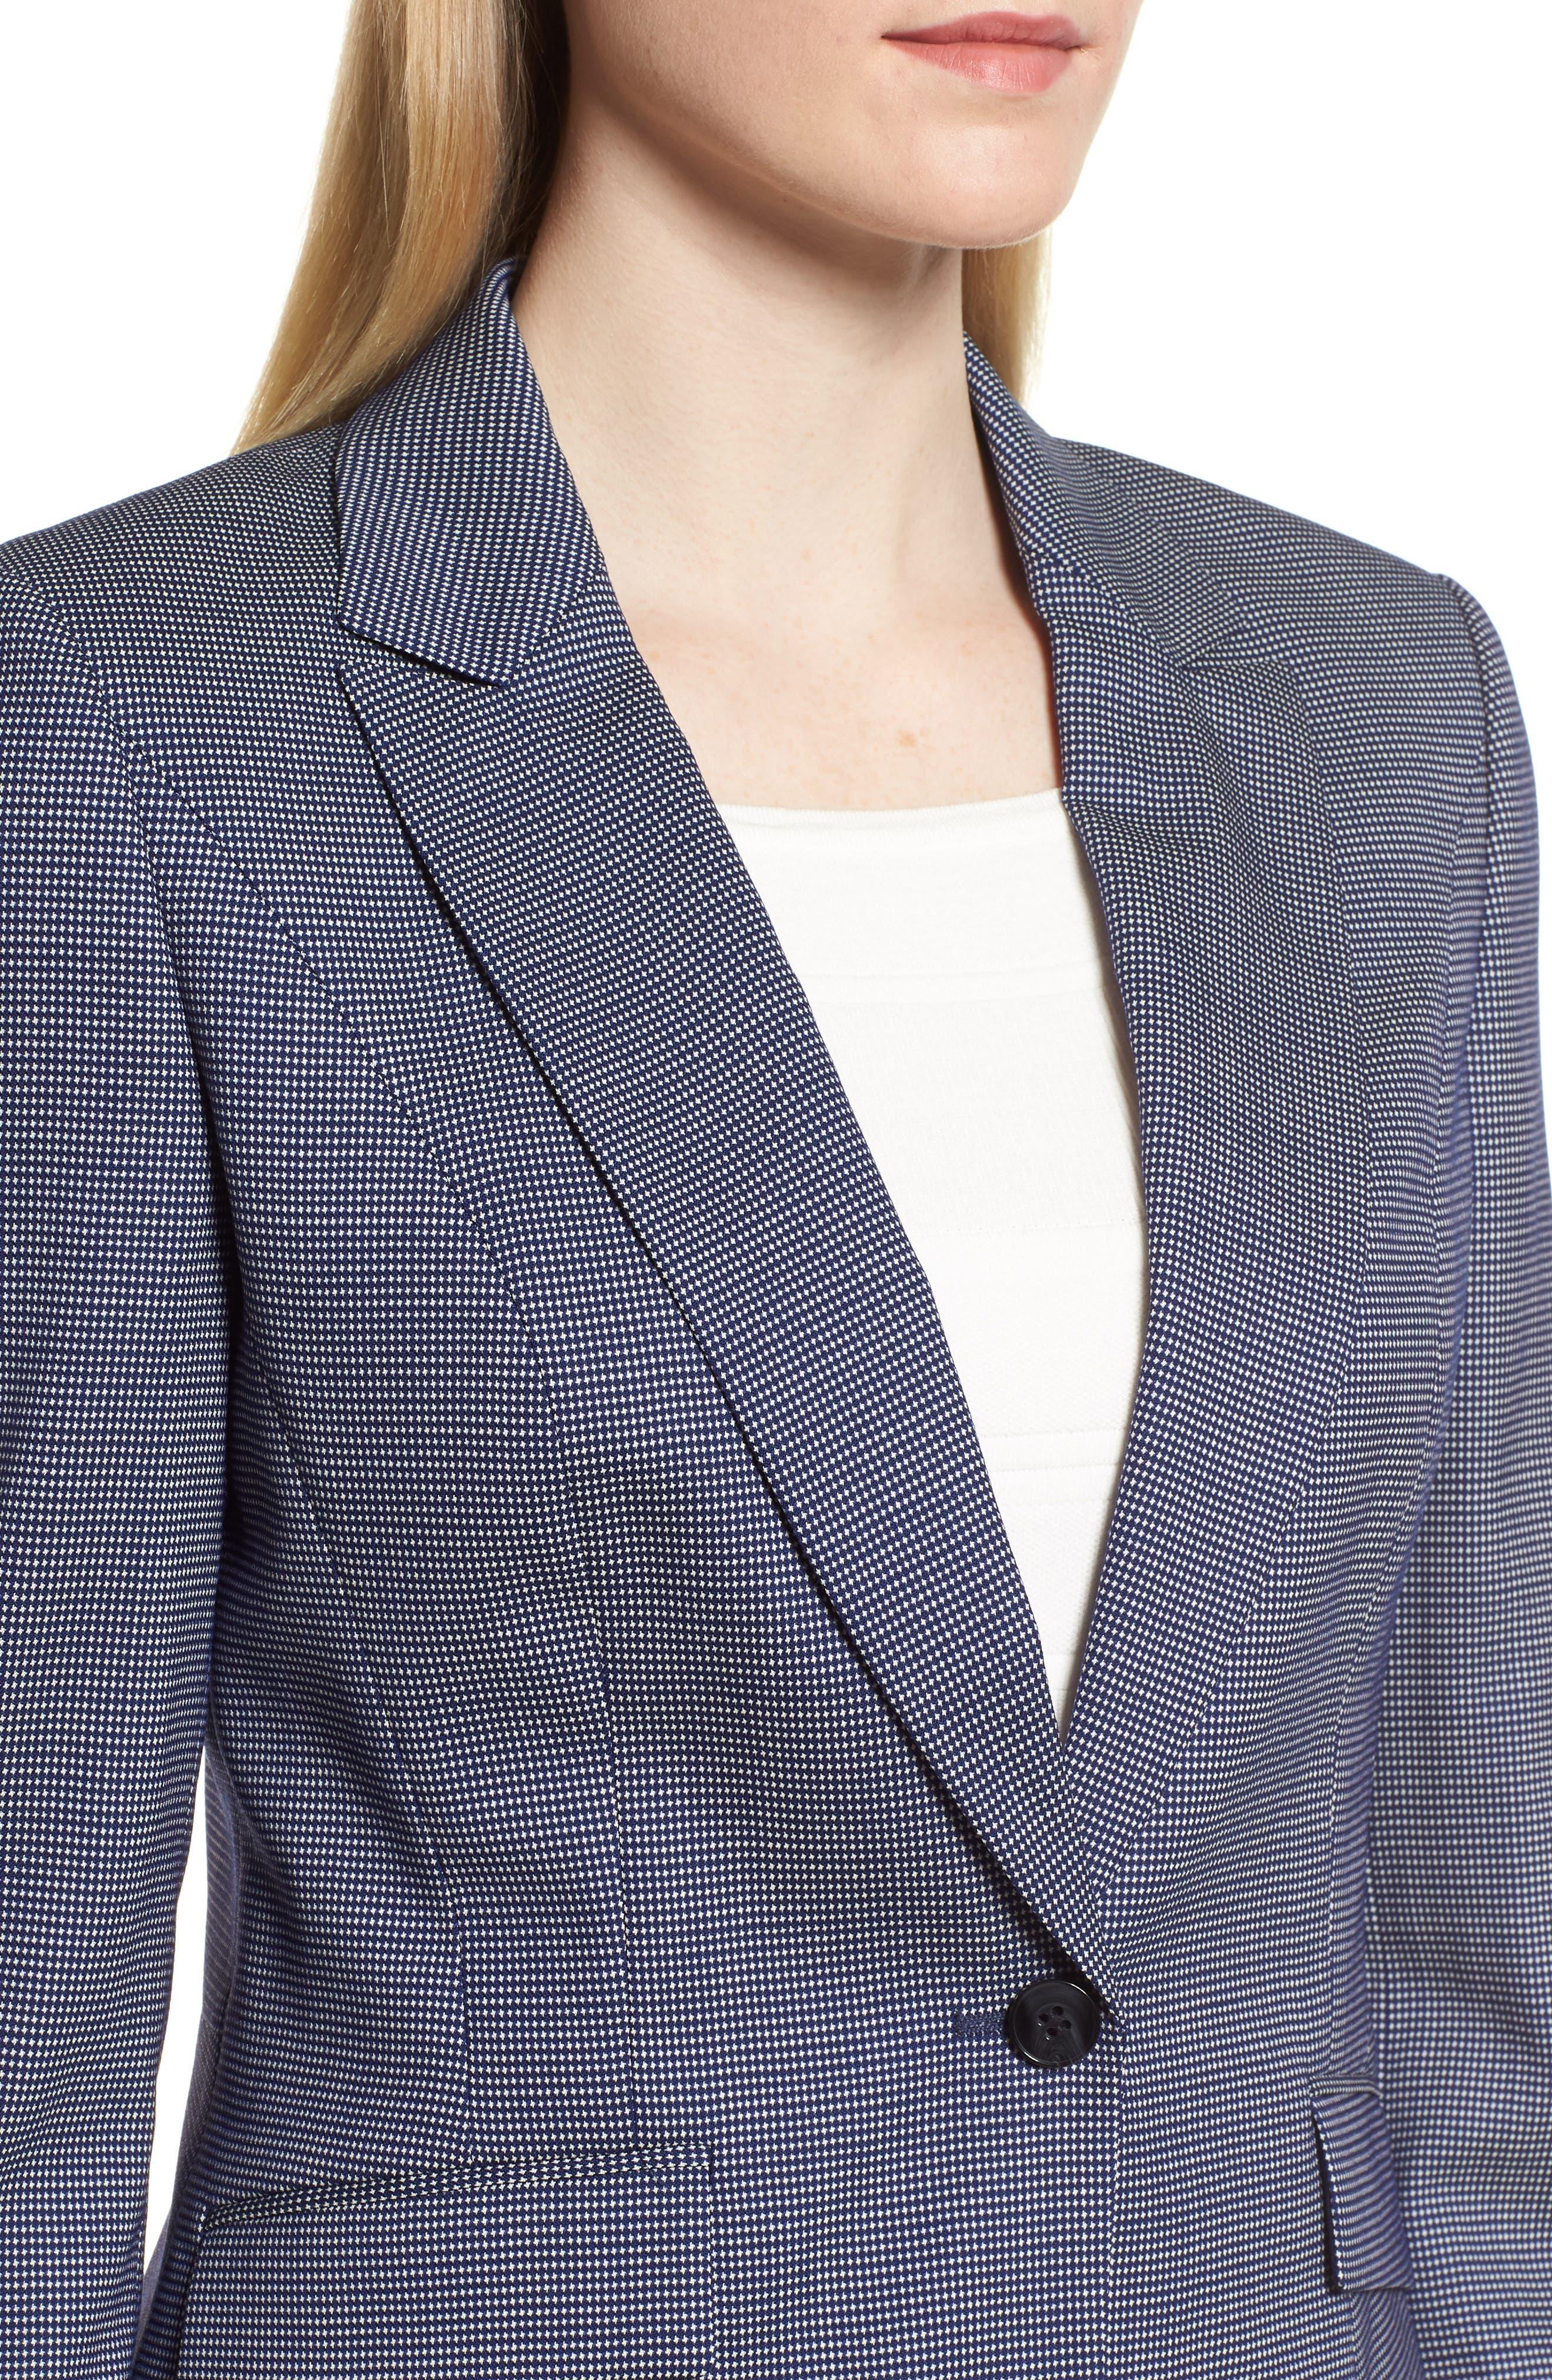 Janora Minidessin Jacket,                             Alternate thumbnail 4, color,                             462